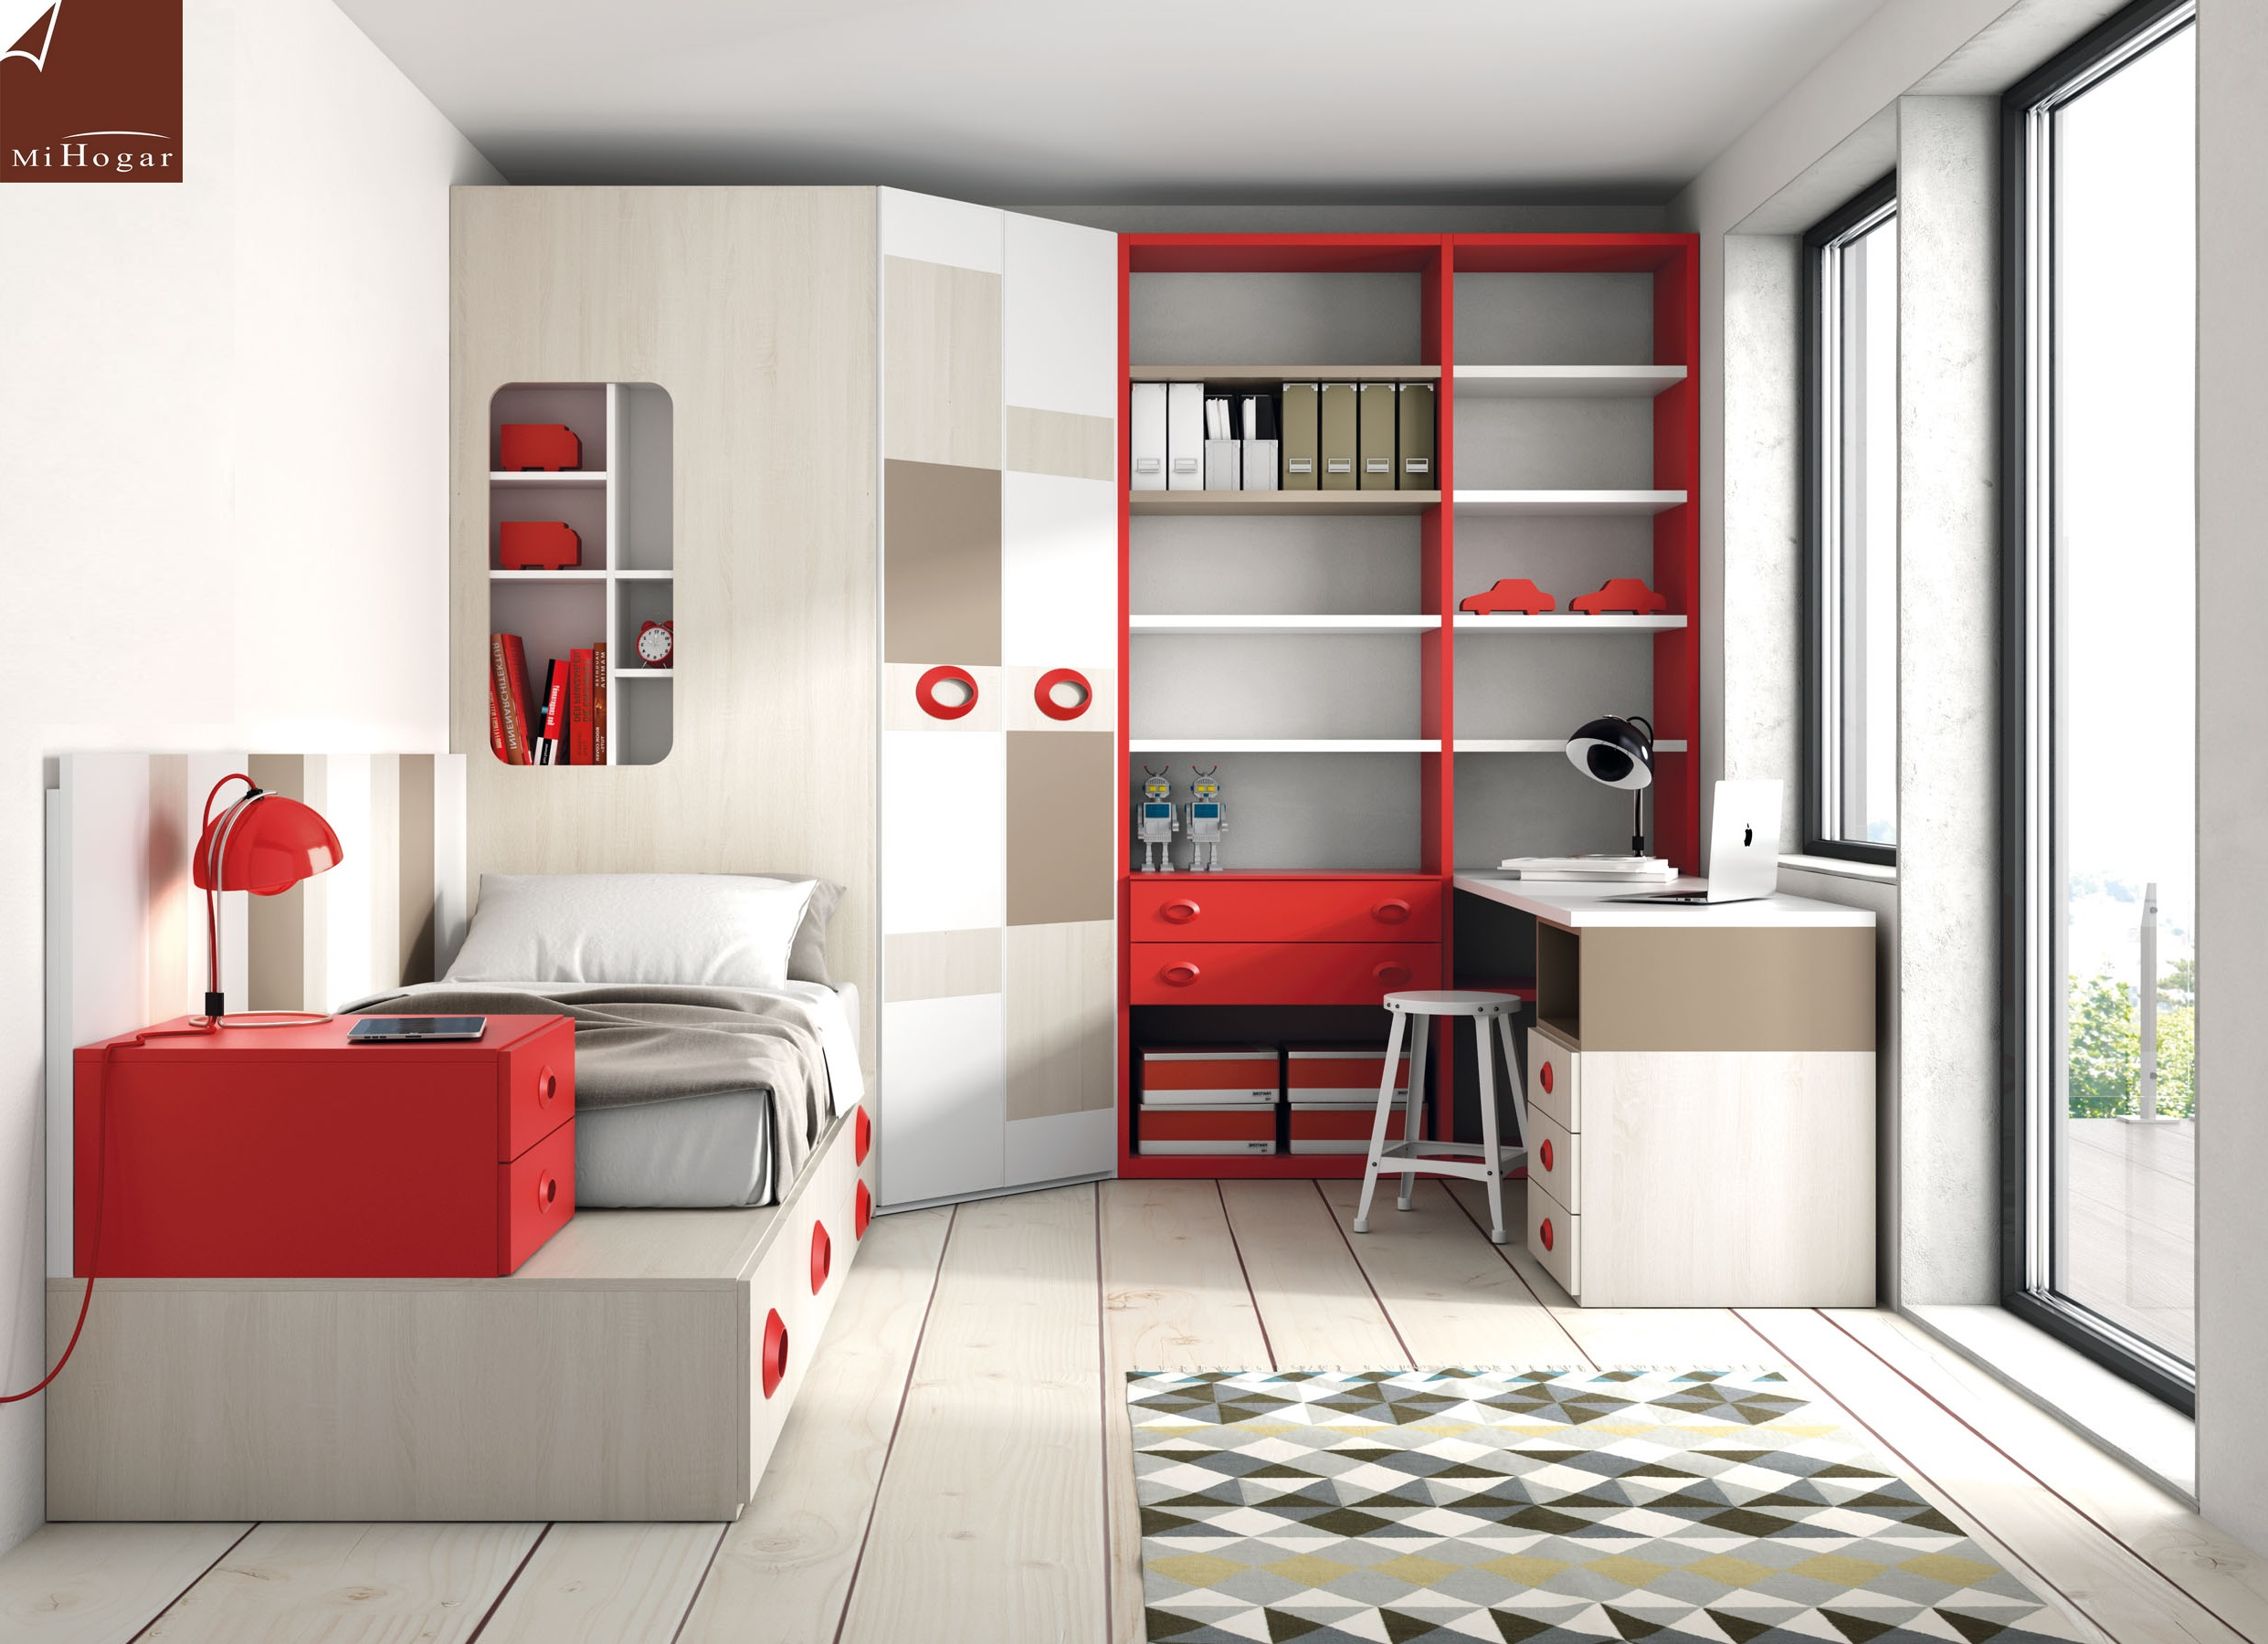 Cat logo dormitorios juveniles tmb muebles mi hogar - Muebles dormitorio juvenil ...